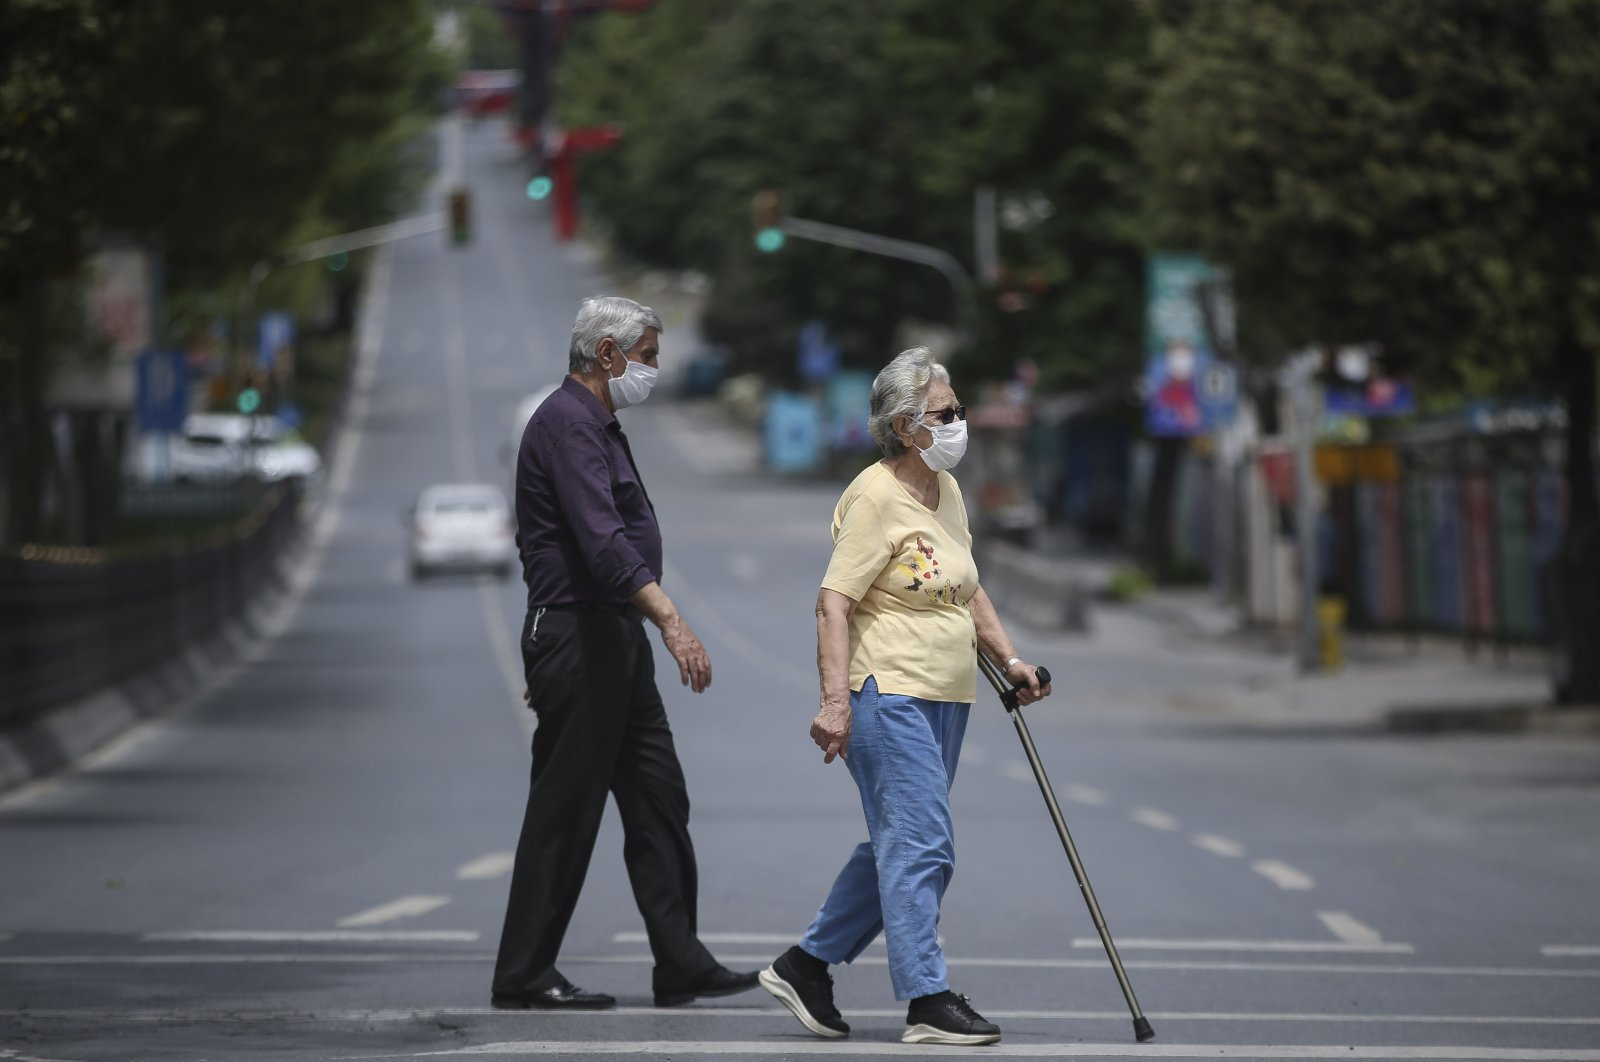 An elderly man and woman walk on the street in Istanbul's Beşiktaş district, Turkey, May 17, 2020. (AA Photo)